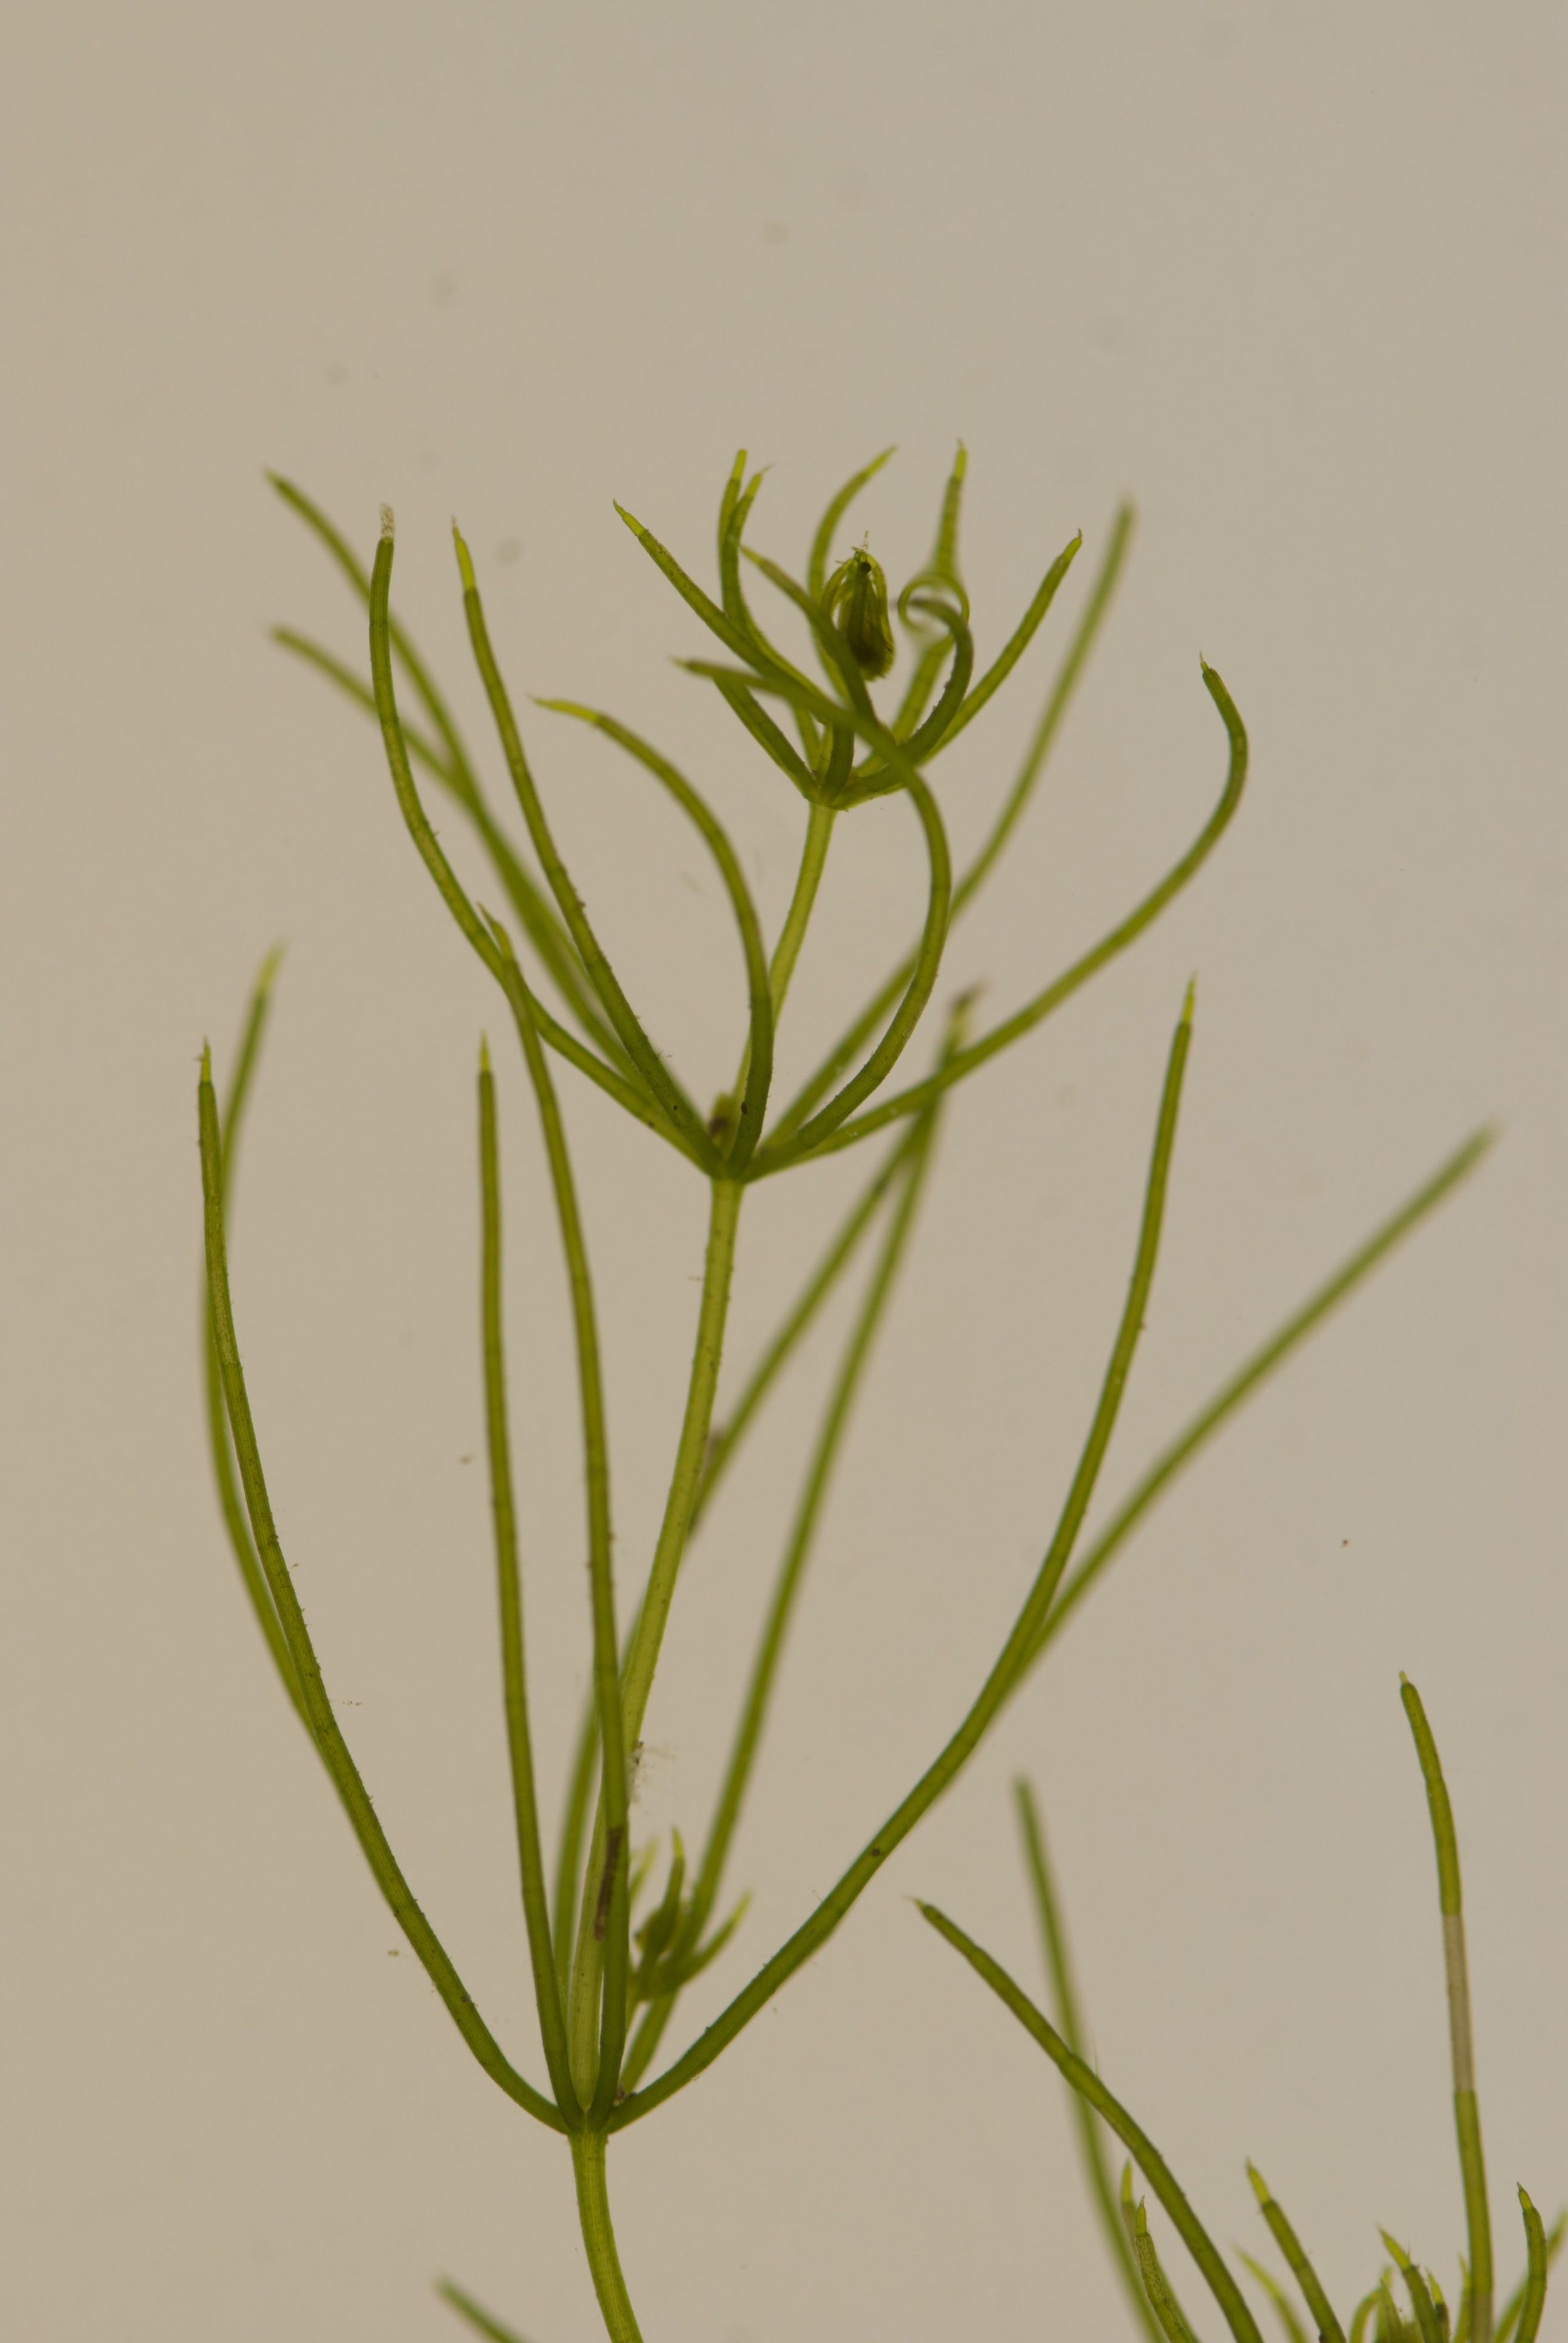 Chara.globularis.000020546.jpeg